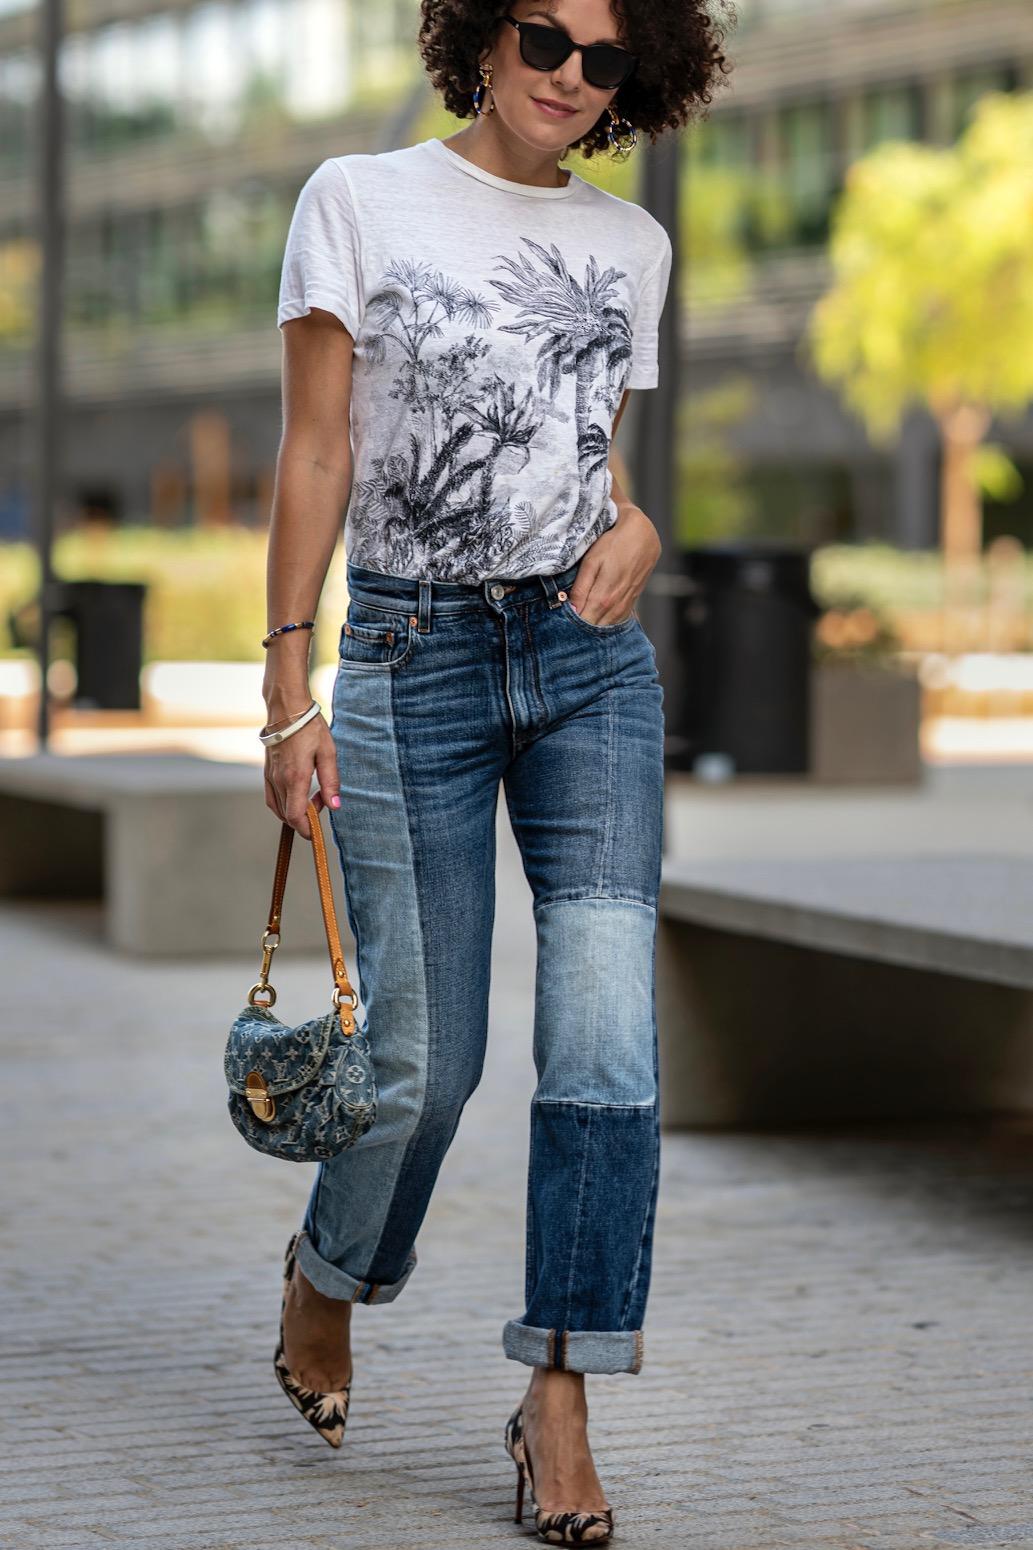 Girl in denim walking in the street